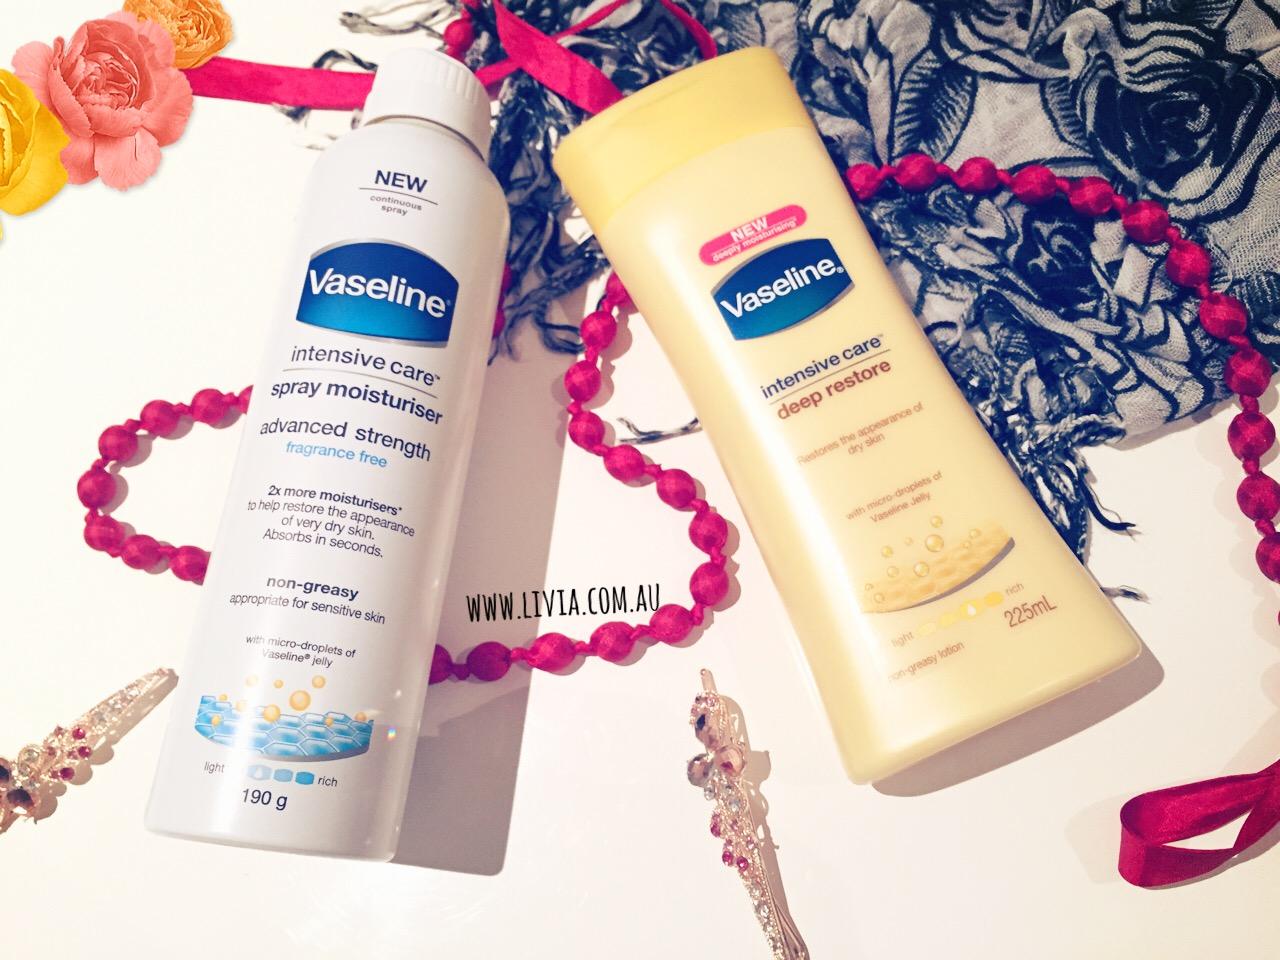 L I V A Winter Essentials Include The Vaseline Range Feat Their Advance Strength 400 Ml New Intensive Care Spray Moisturiser Deep Restore Cream Revew